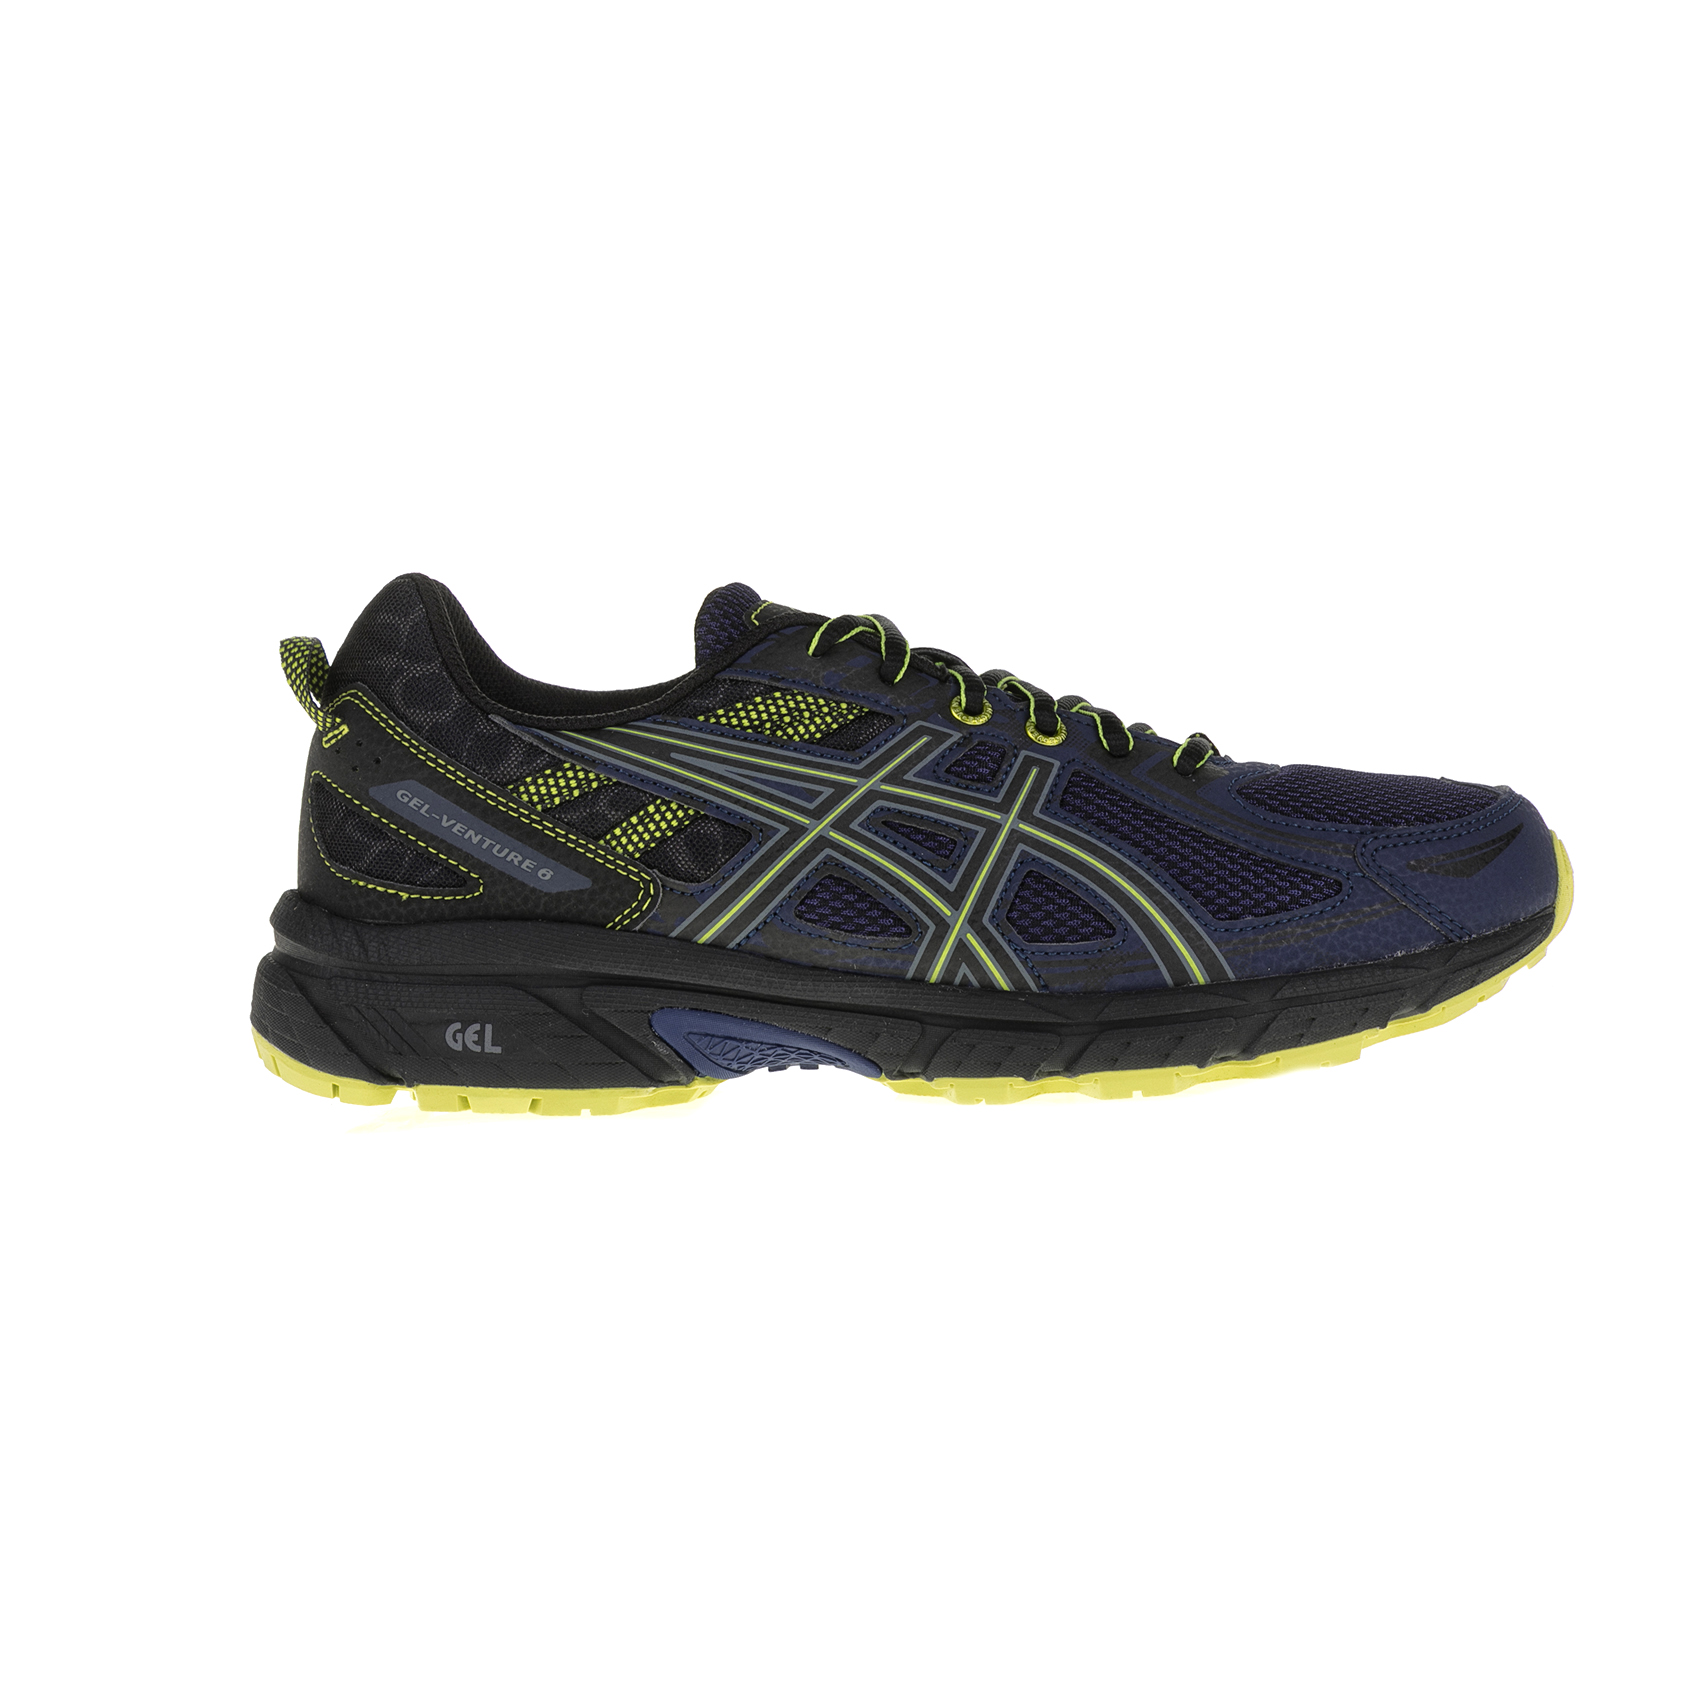 ASICS - Ανδρικά αθλητικά παπούτσια ASICS GEL-VENTURE 6 GS μαύρα-μπλε ανδρικά παπούτσια αθλητικά running